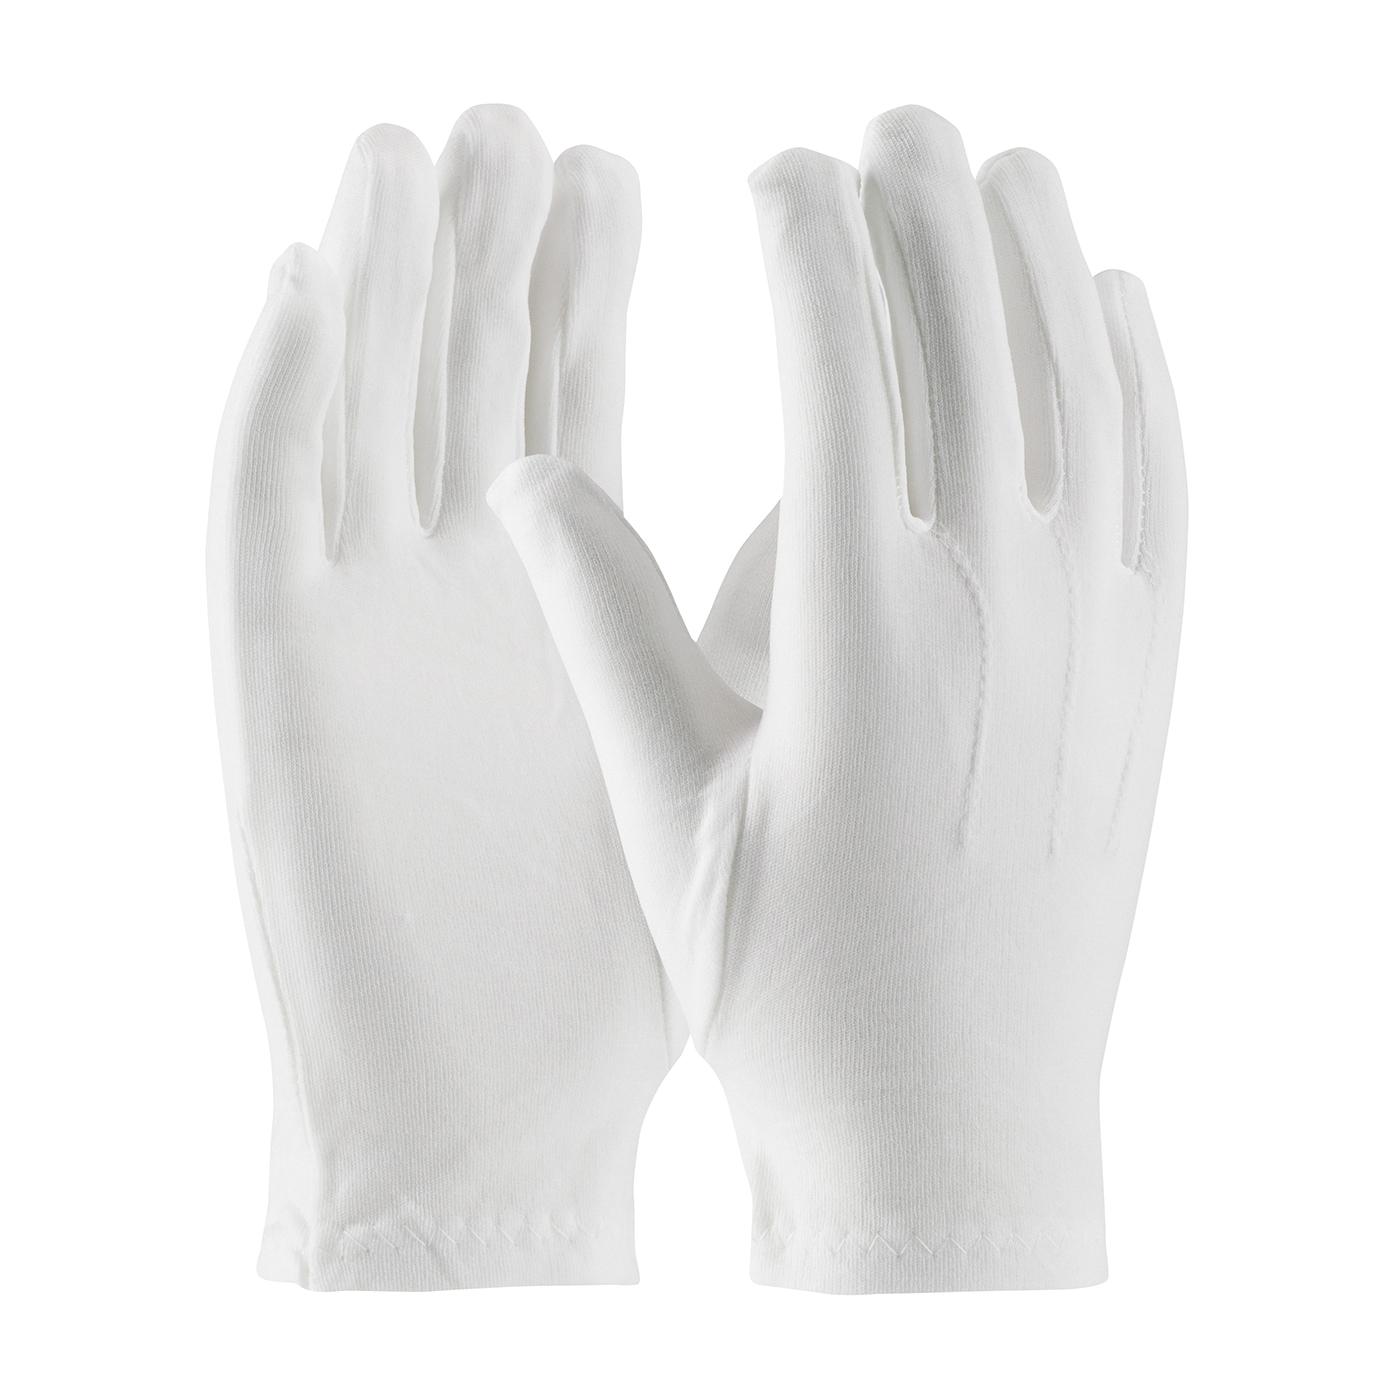 PIP® Cabaret™ 130-600WL Cabaret™ Ladies Dress Gloves With Raised Stitching on Back, Nylon, White, Unlined Lining, Open Cuff